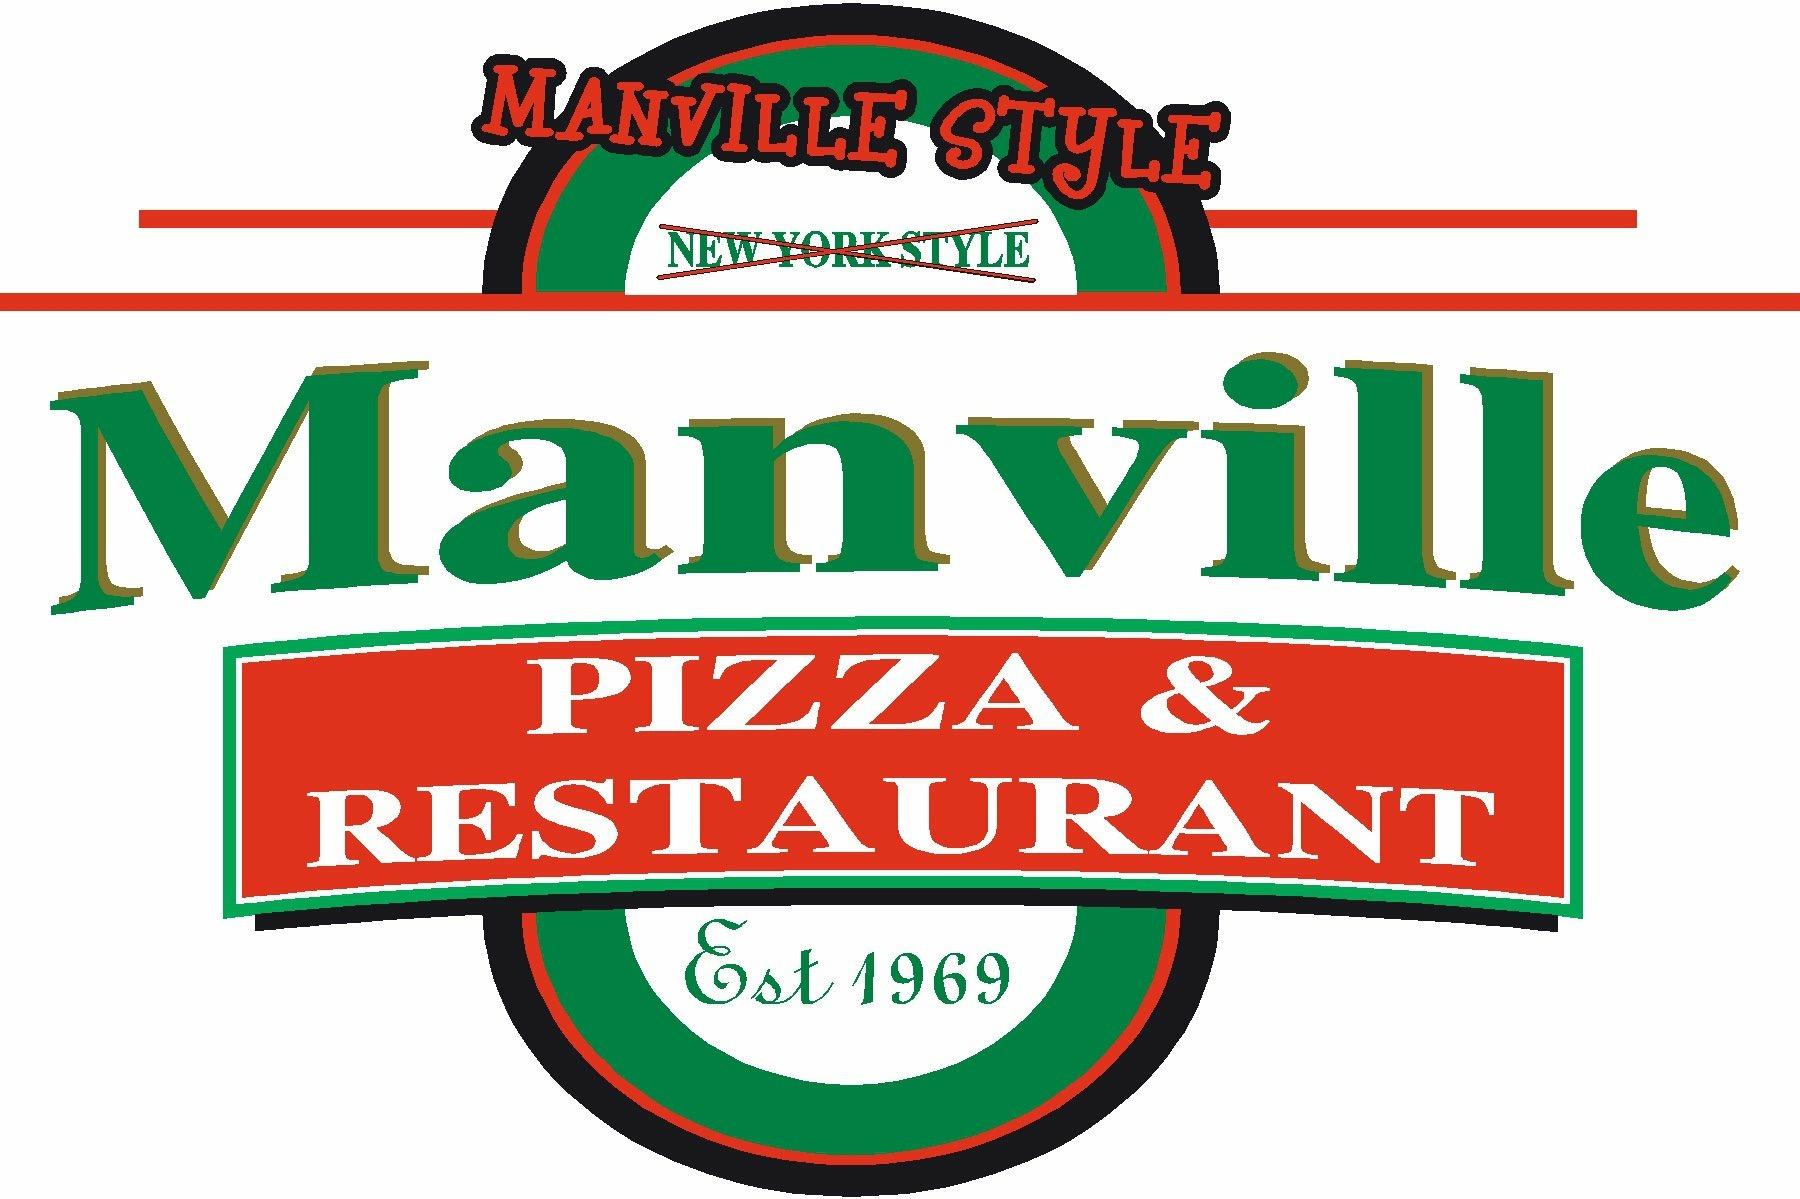 ManvillePizza.jpeg